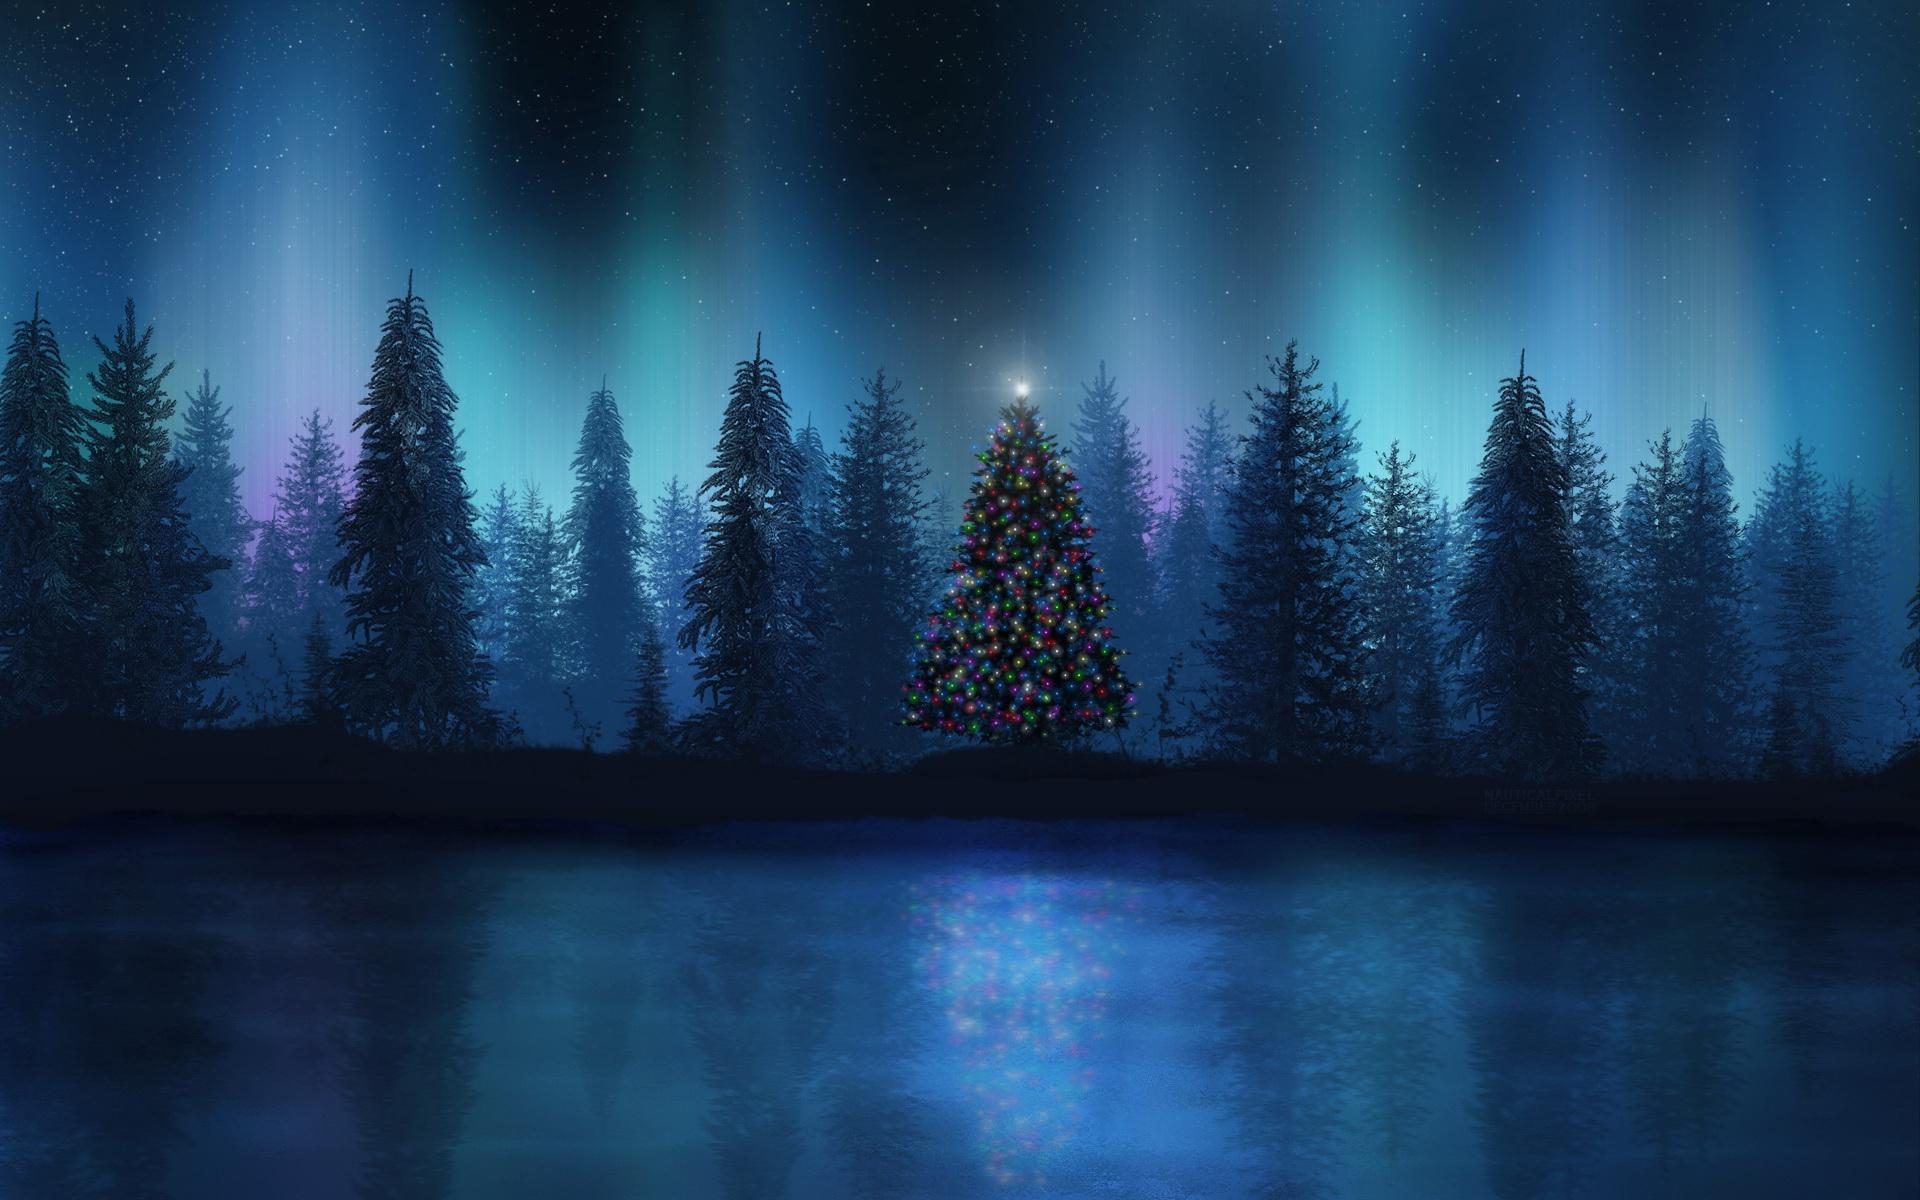 Christmas Hd Wallpaper Background Image 1920x1200 Id